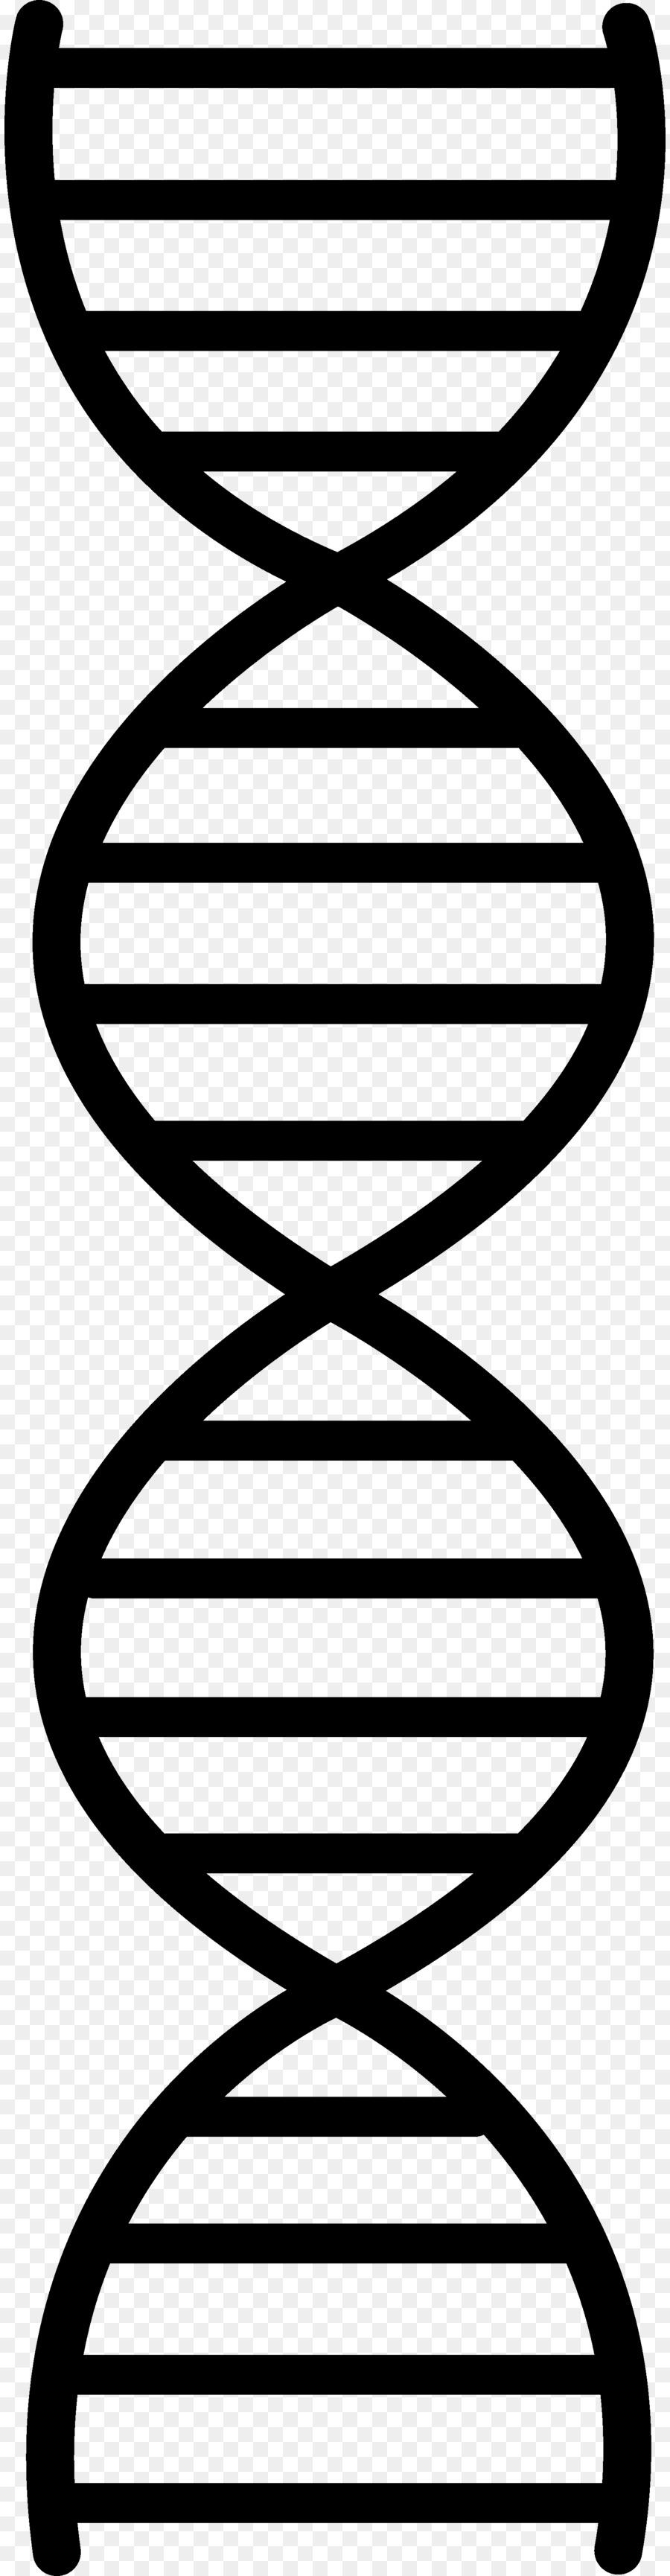 900x3460 Dna Replication Nucleic Acid Double Helix Clip Art